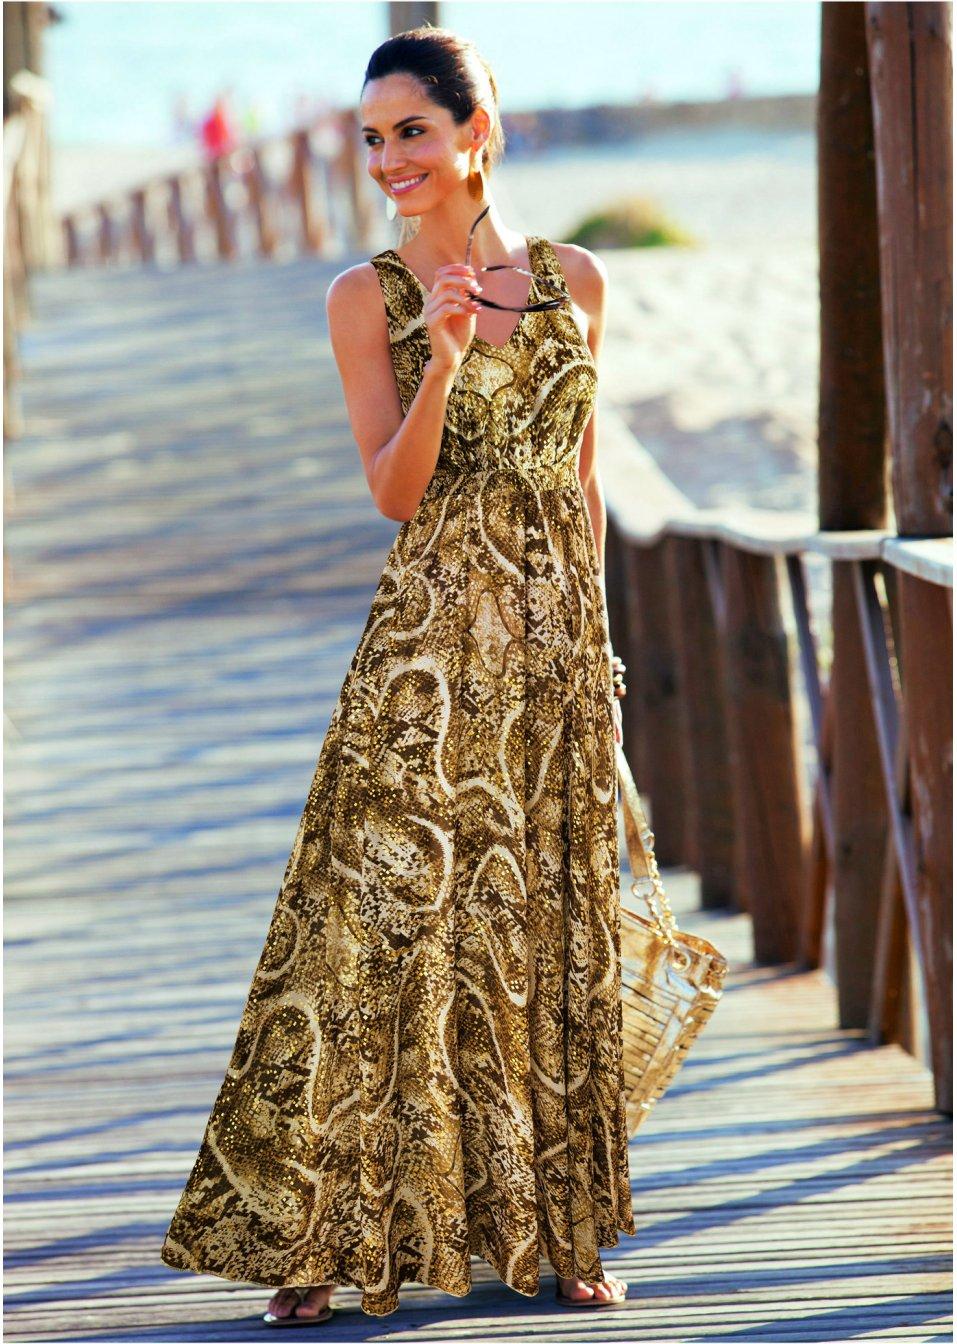 b303793a9d04 Abito lungo fantasia Bianco panna   oro fantasia - Donna - bpc selection  premium - bonprix.it